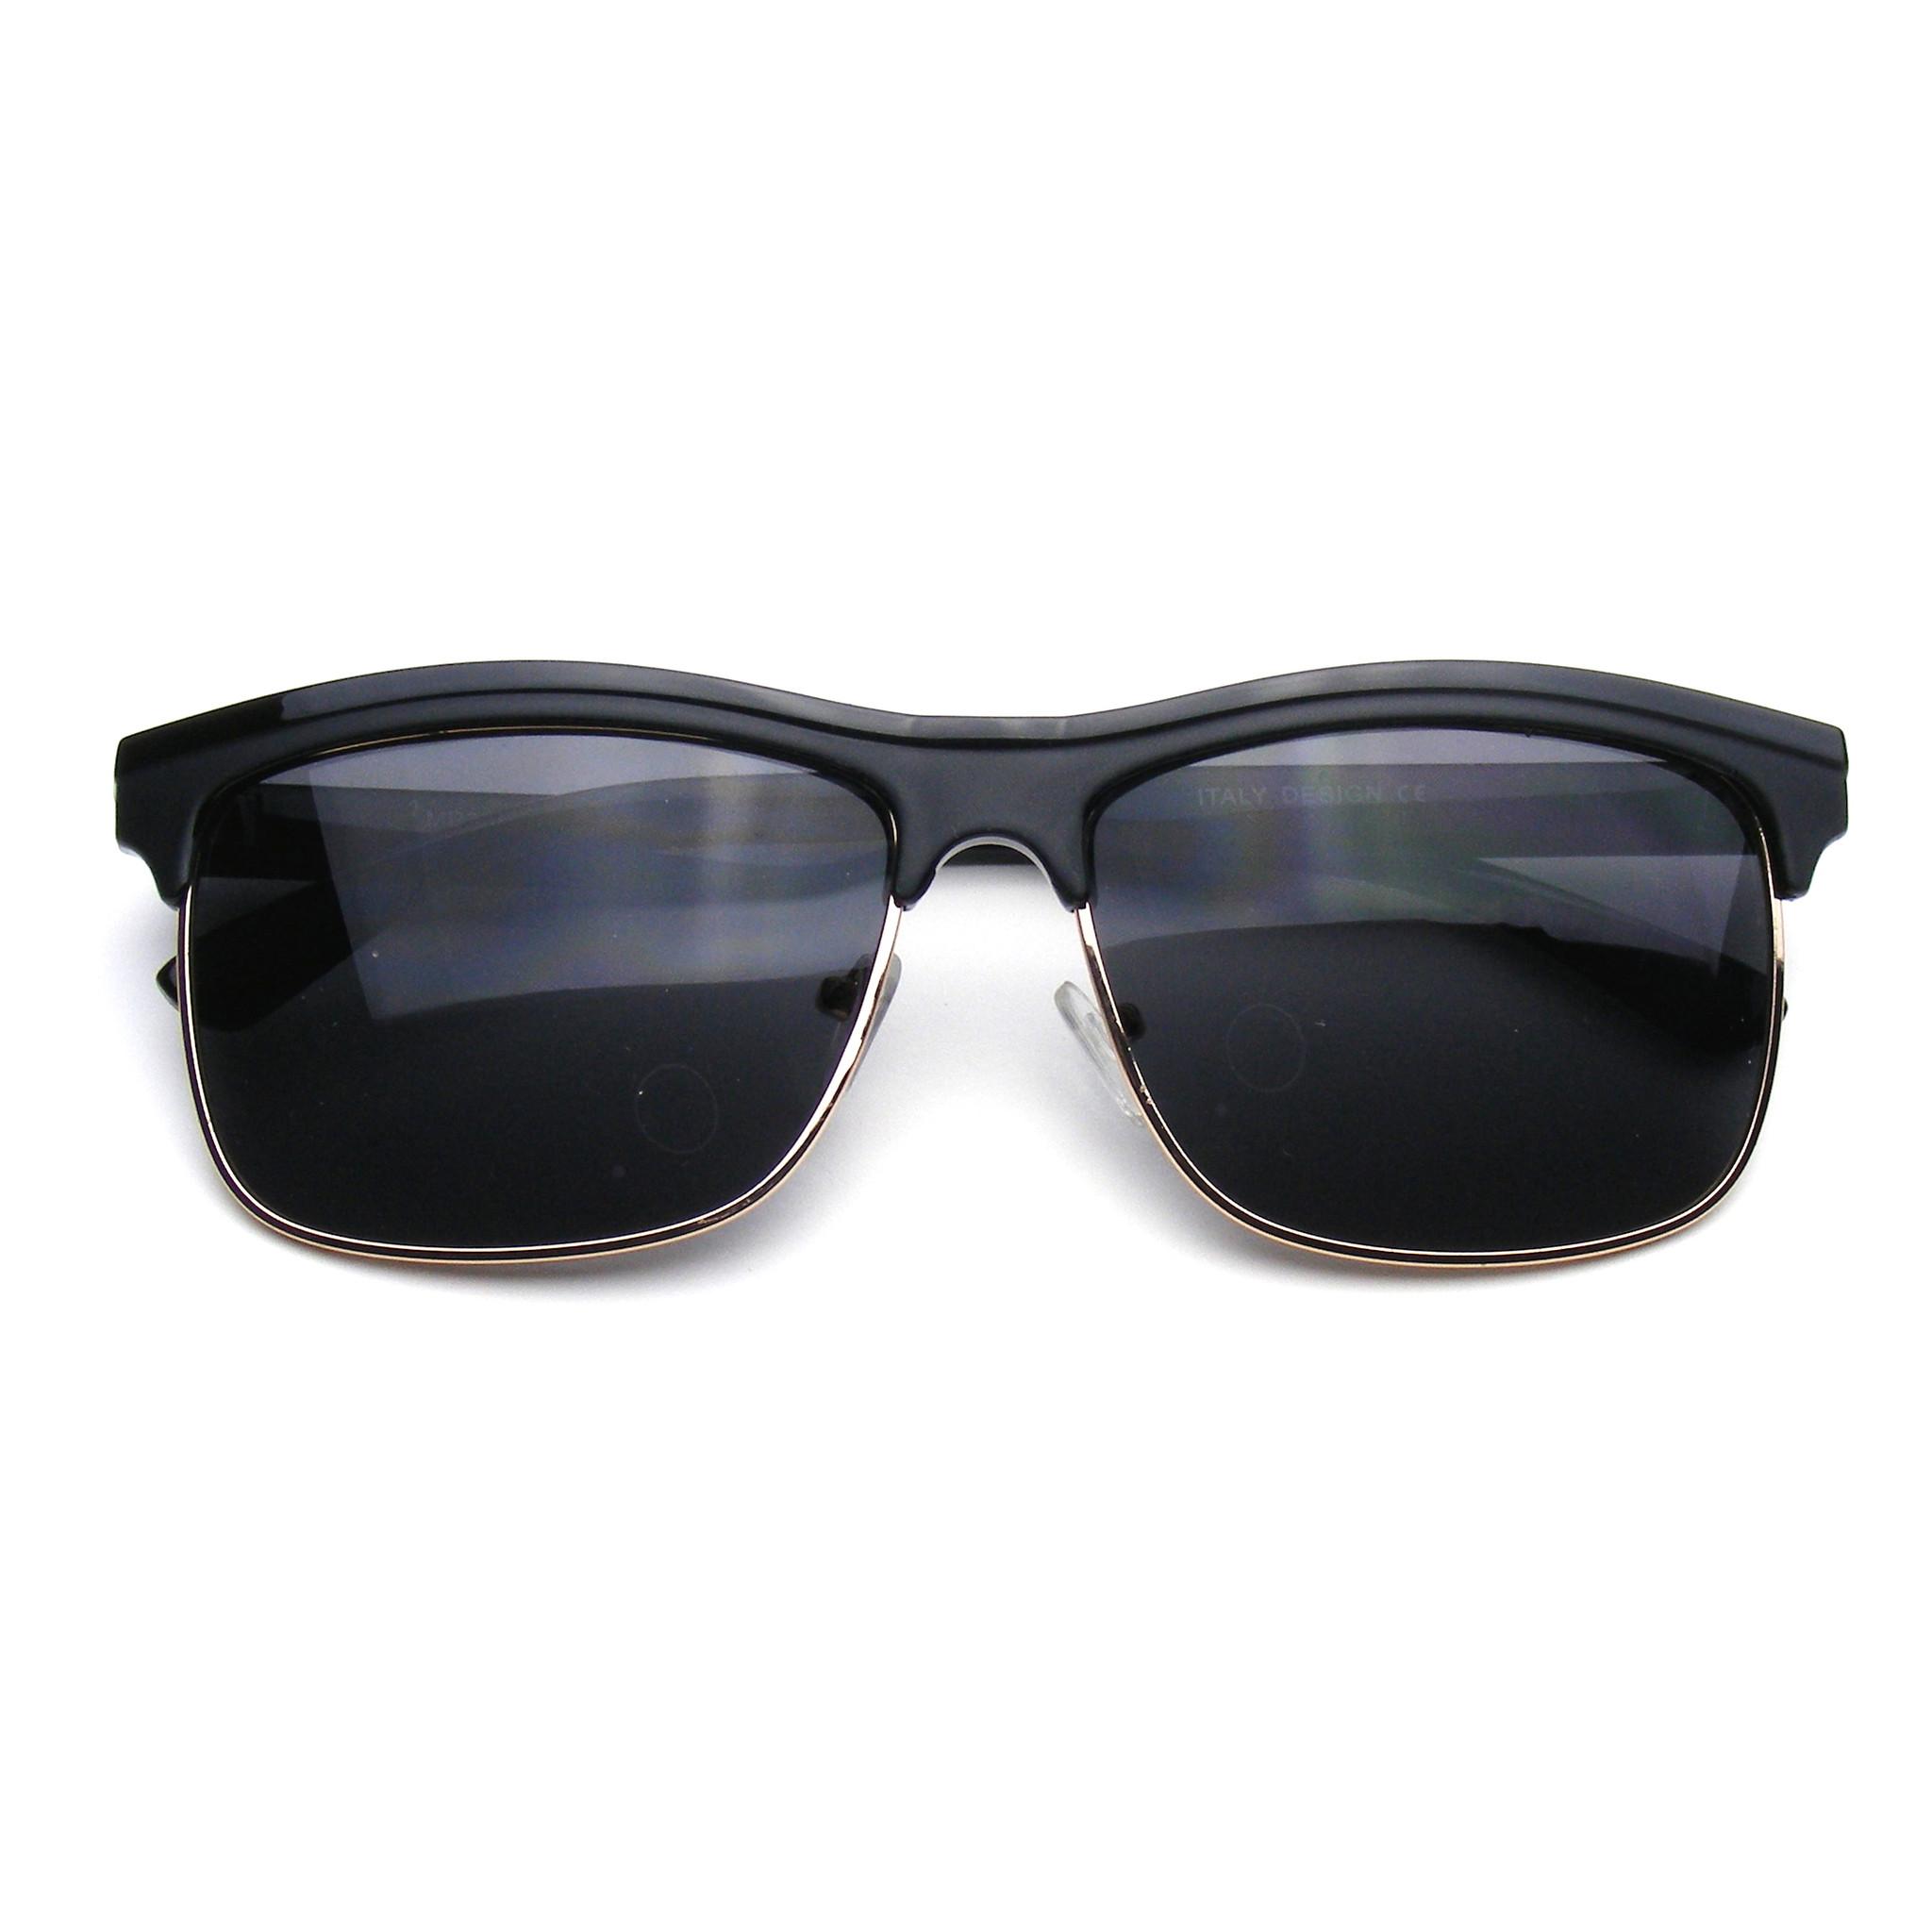 Retro clubmaster inspired modern dapper square half frame sunglasses